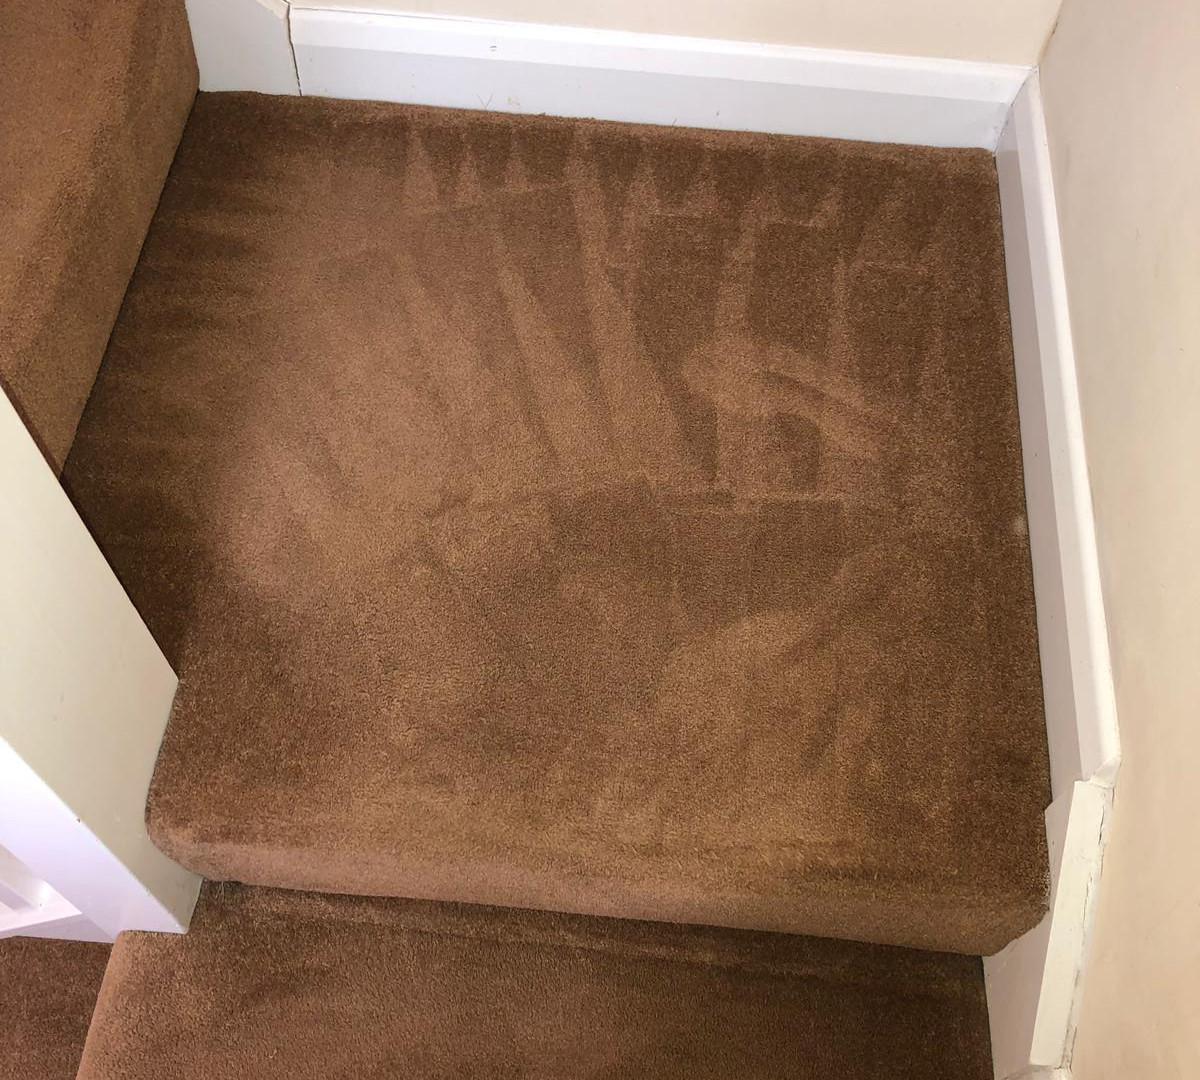 Carpet Cleaning Aylesbury